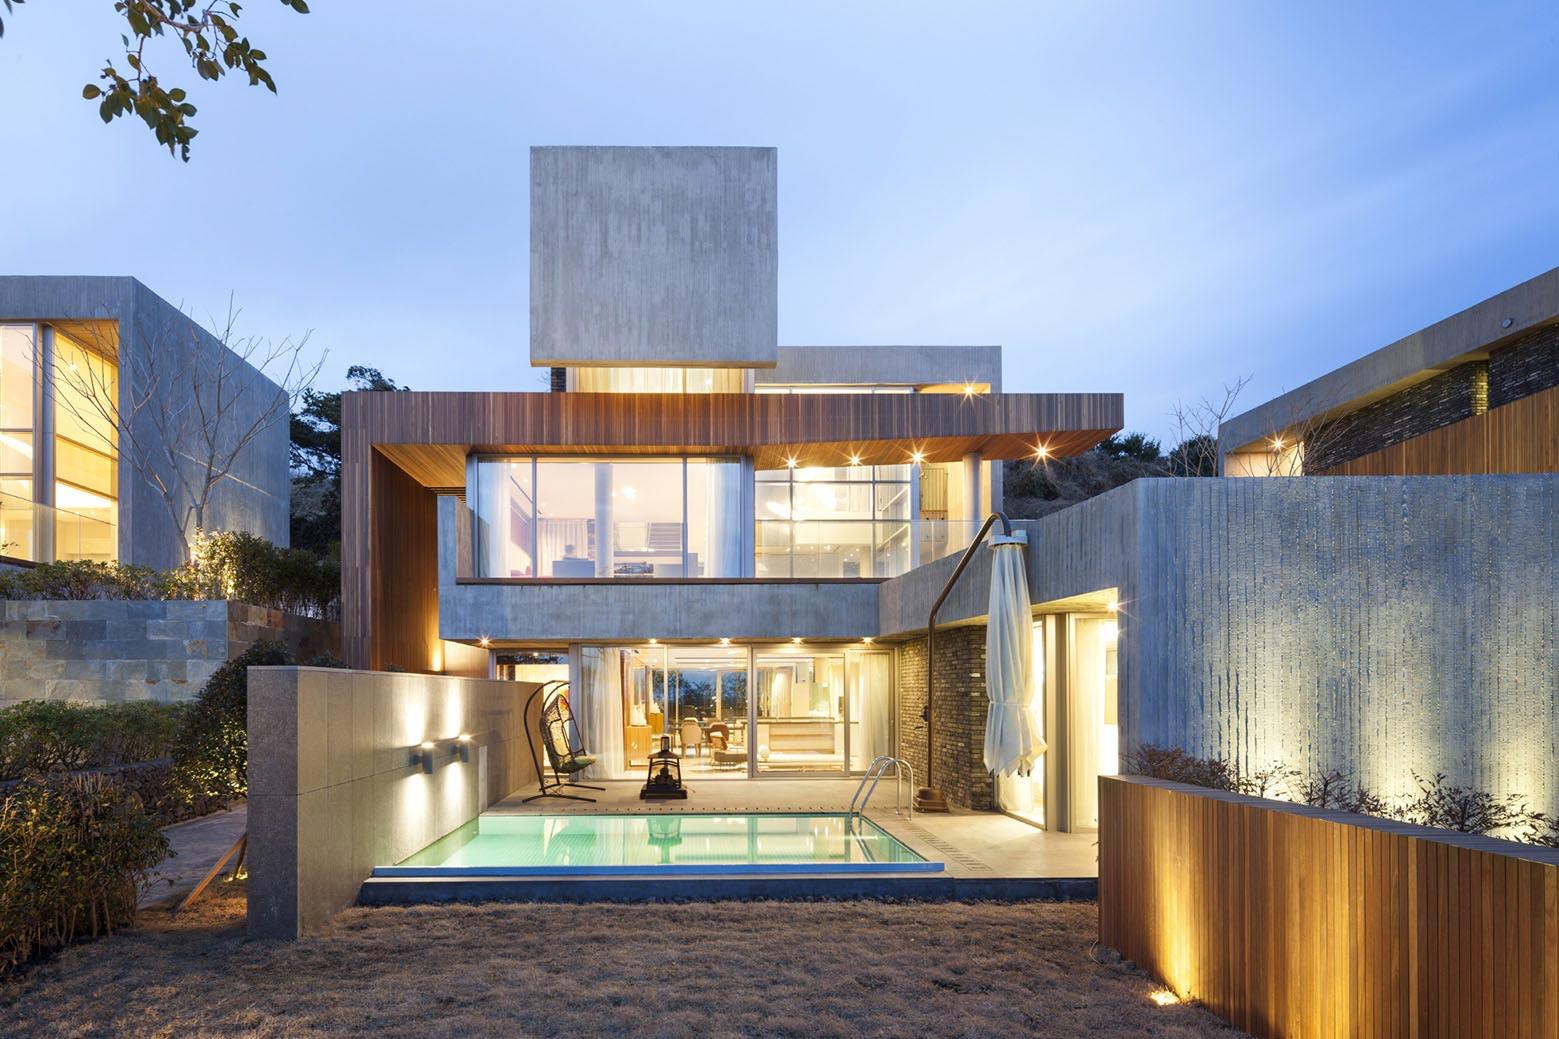 Modern jeju bayhill pool eau design kim dong jin caandesign architecture and home design blog